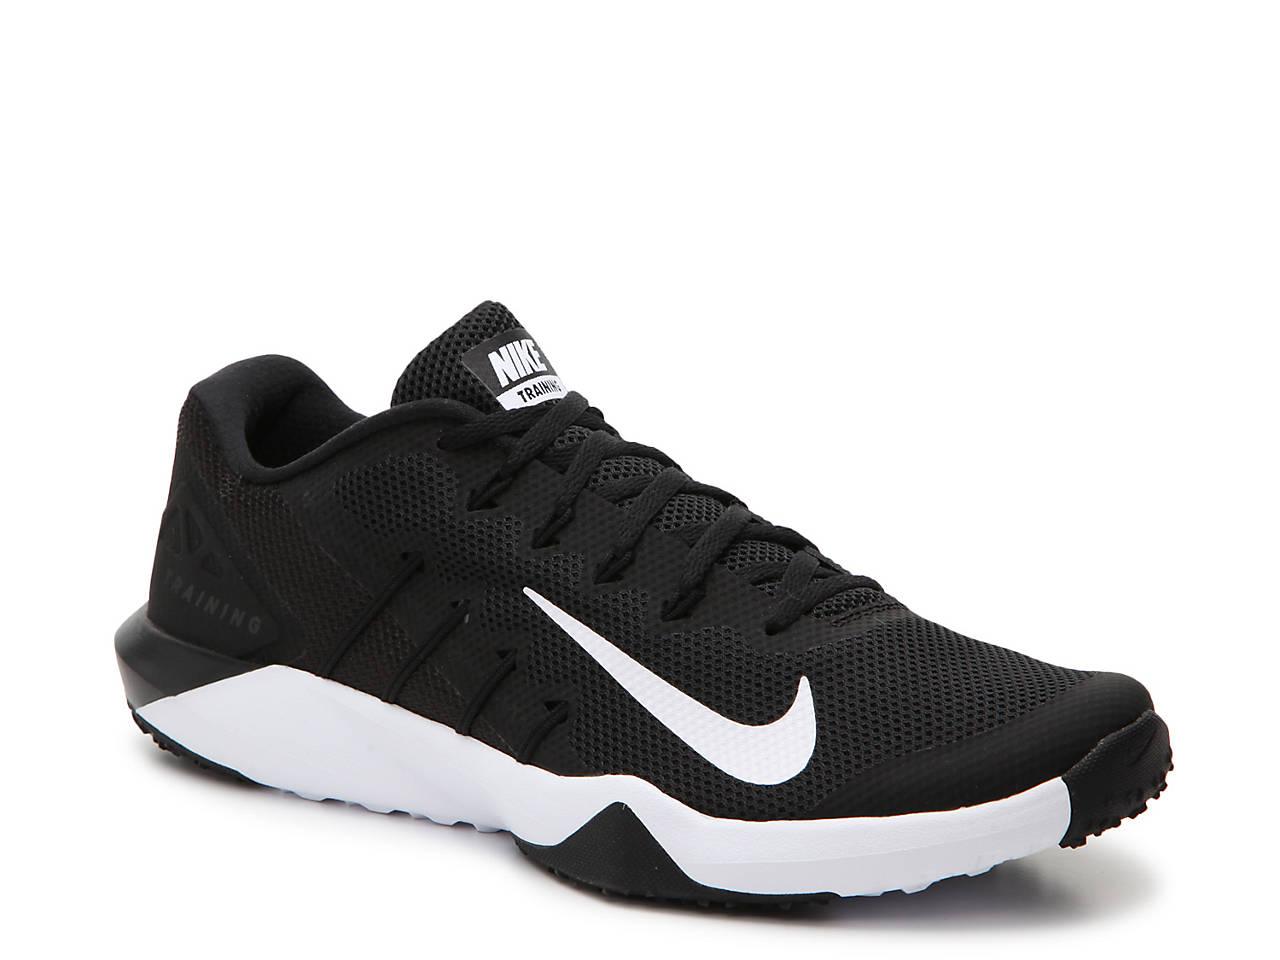 7cc43e7a5e1d Nike Retaliation 2 Performance Training Shoe - Men s Men s Shoes